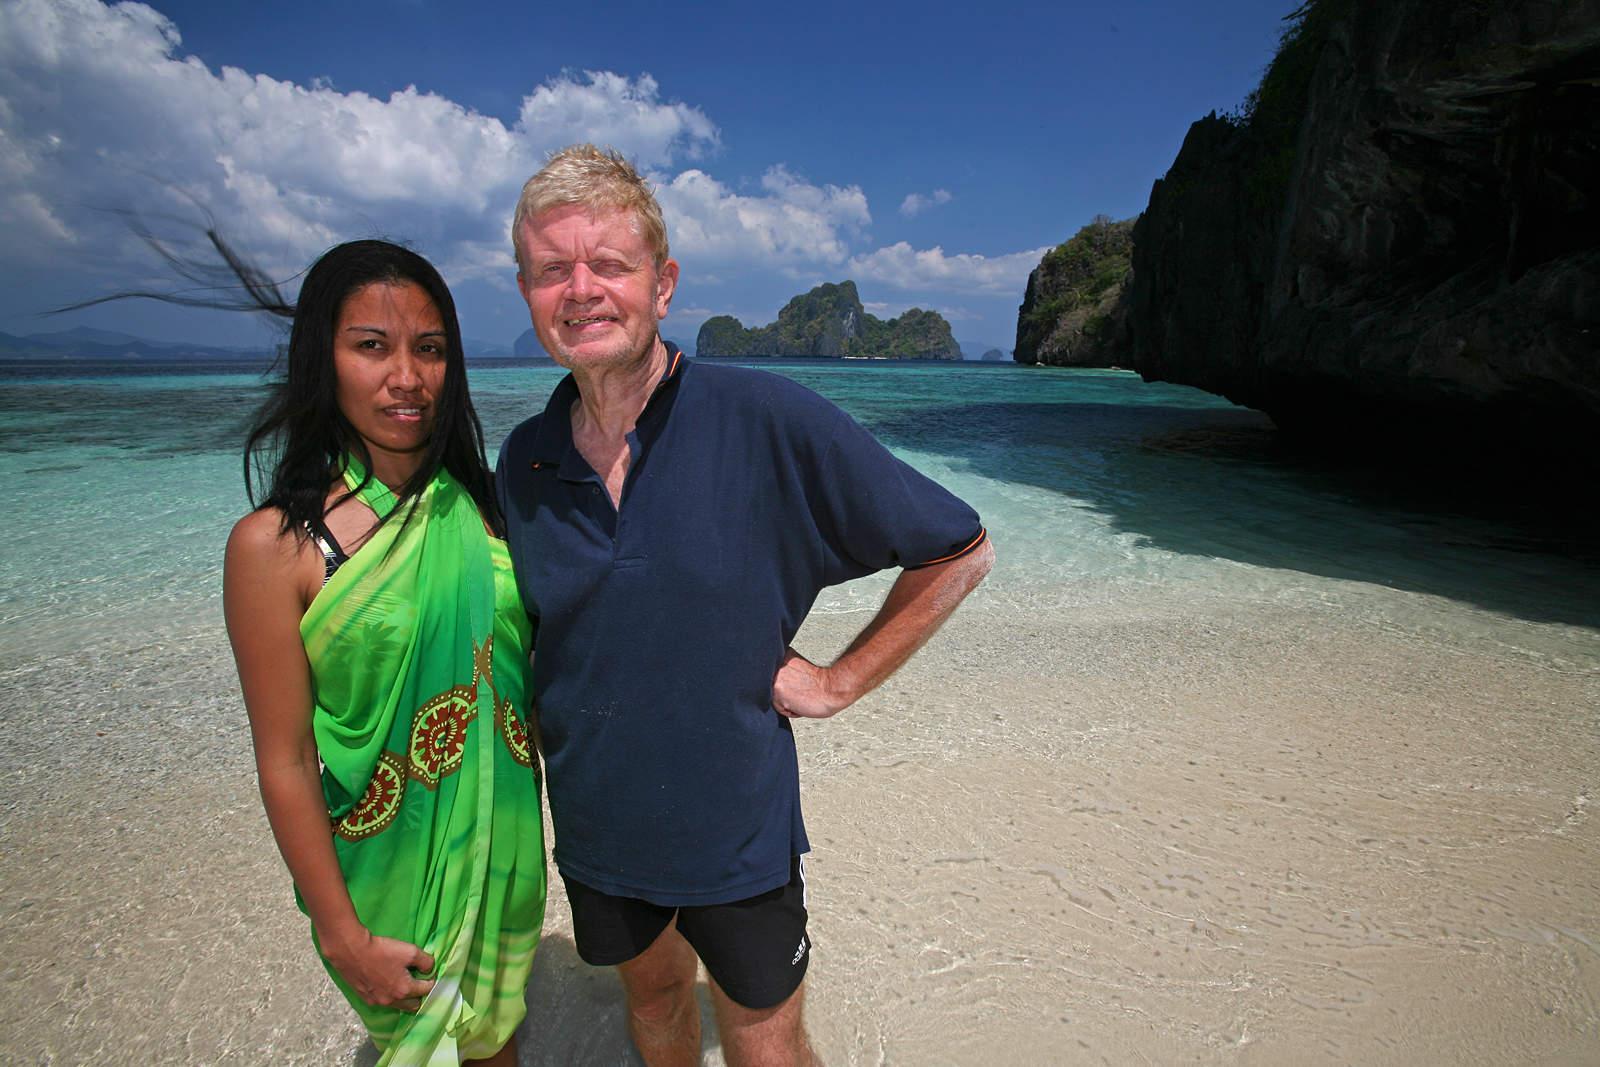 Sex tourism female Sex Vacation